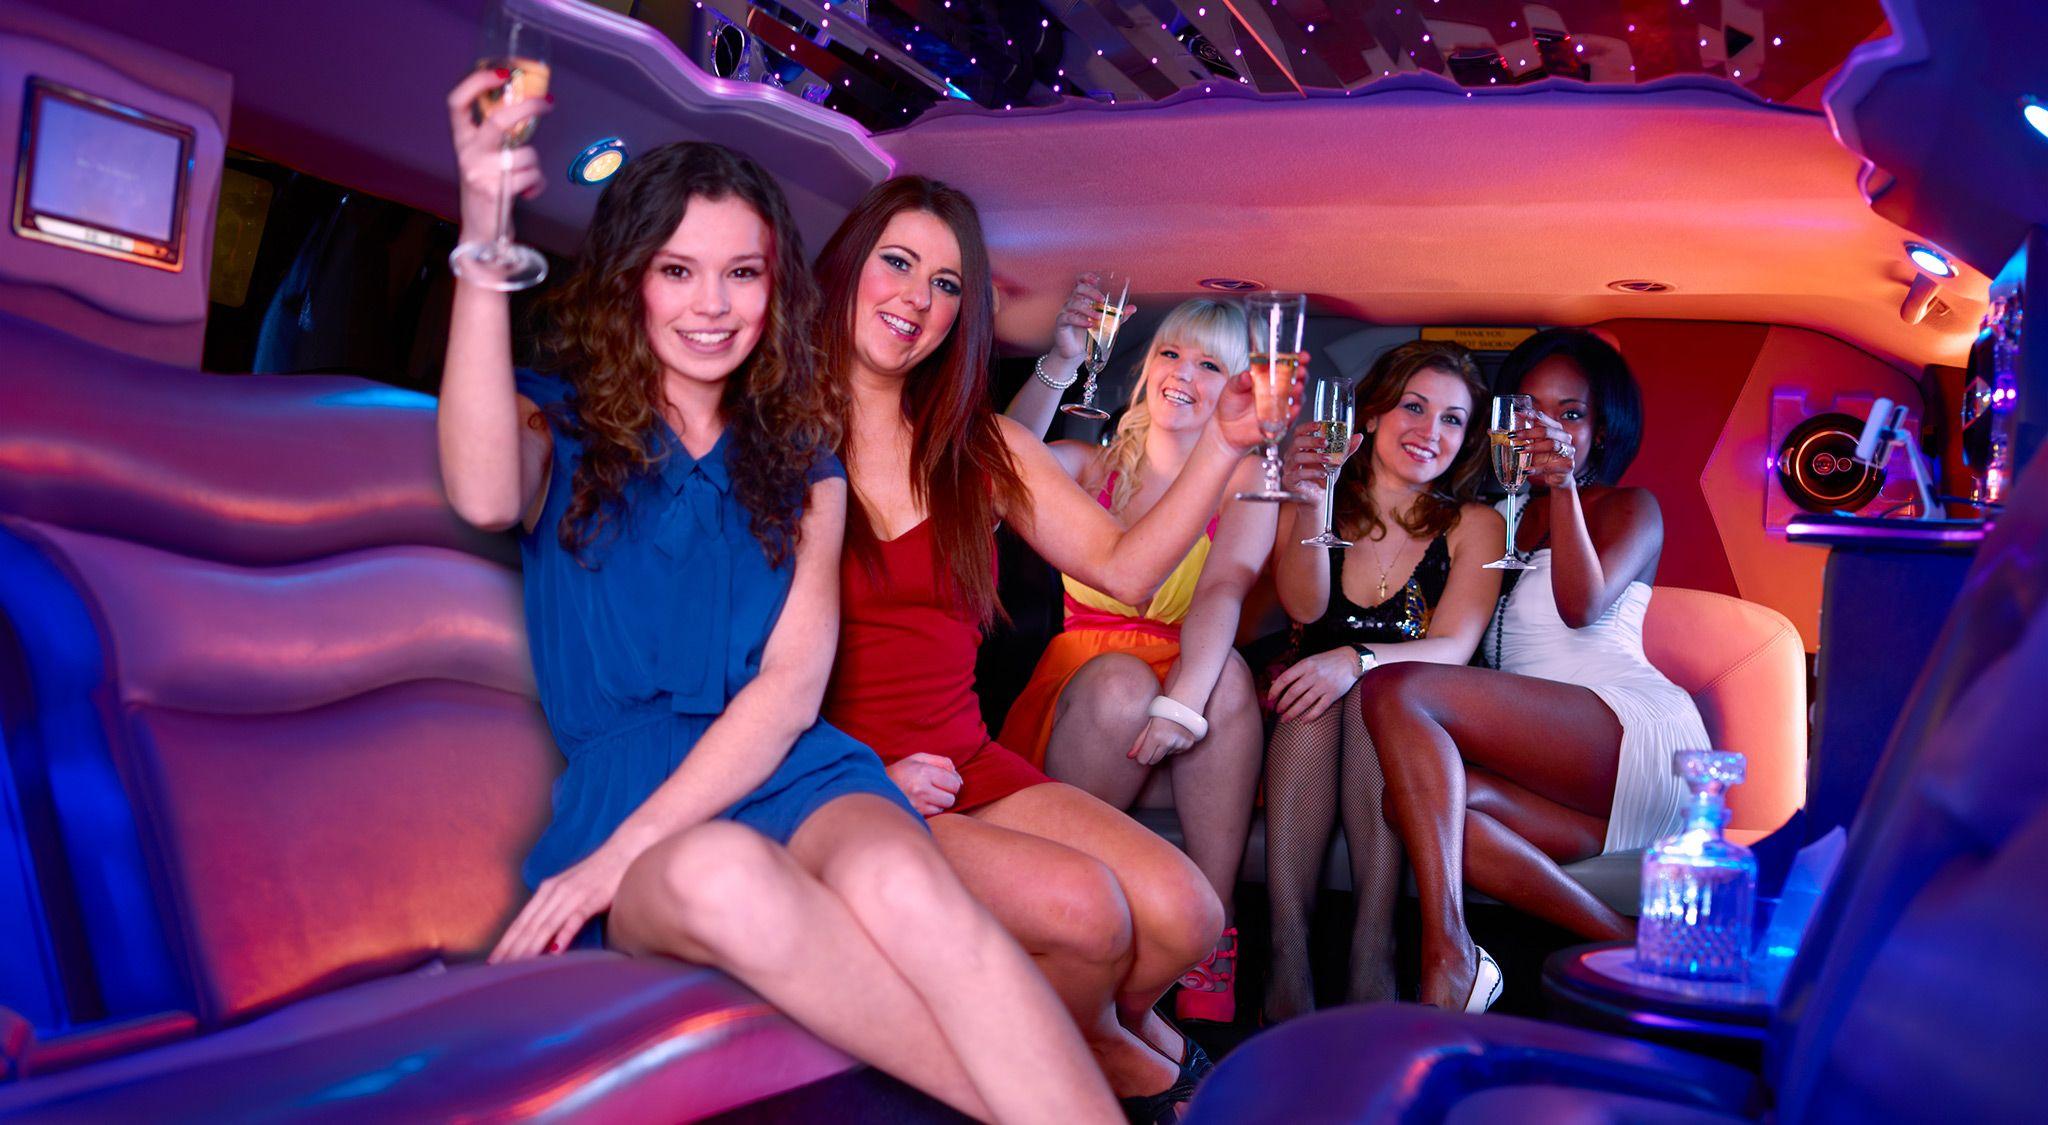 Wynn Las Vegas | Wedding limo service, Limo, Party bus rental